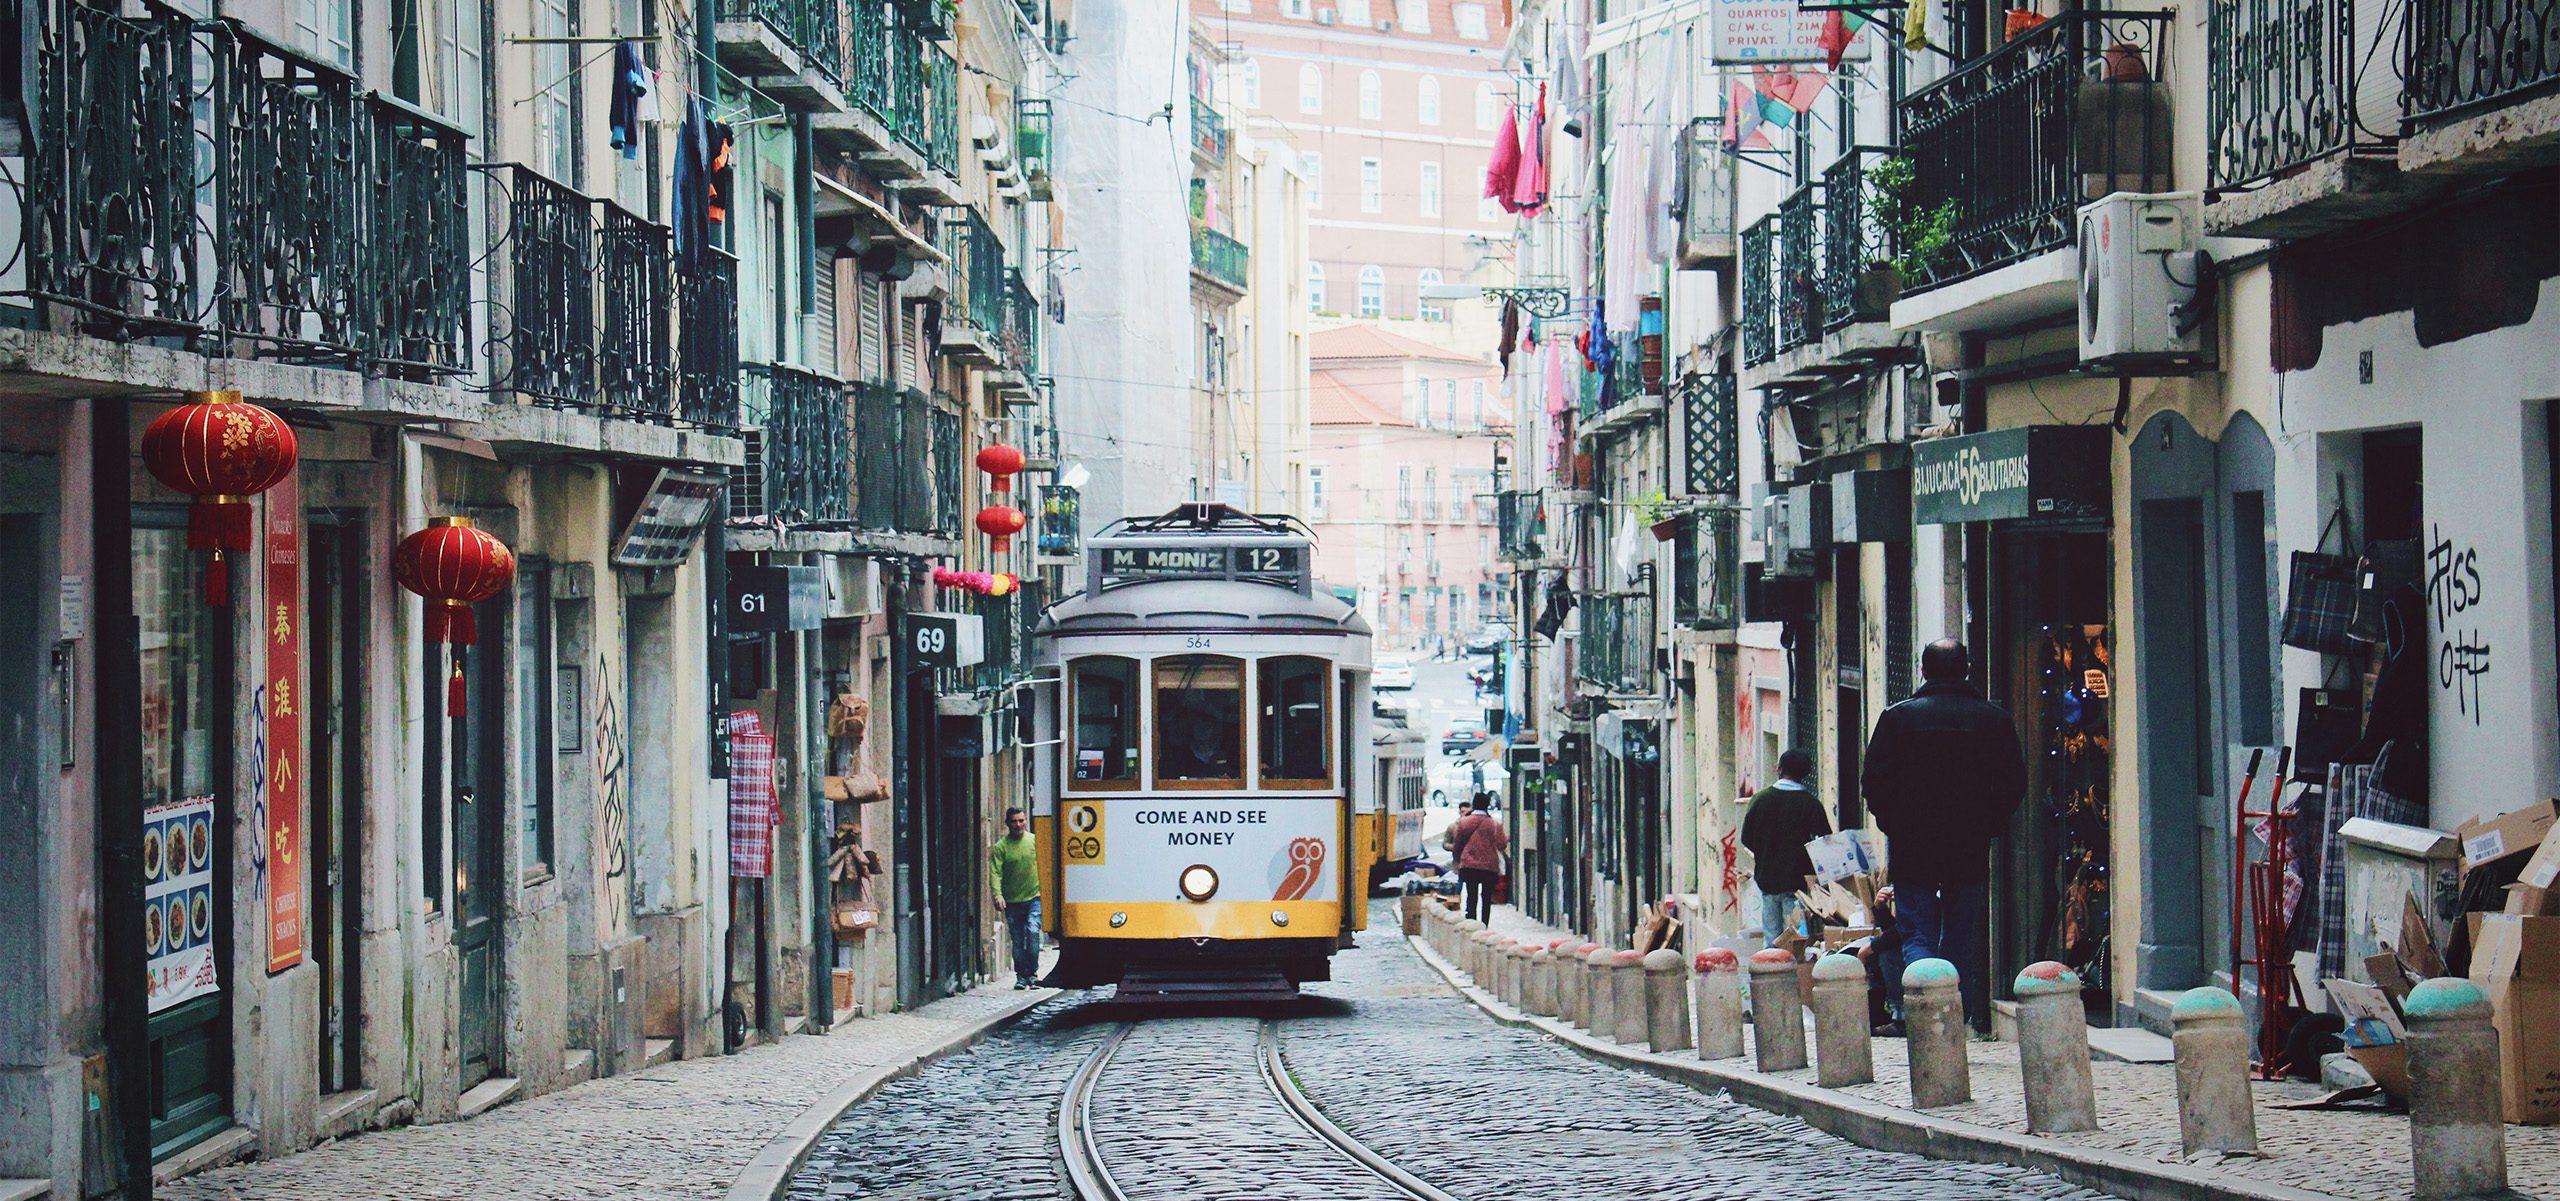 Portugal - Lisbon - Tram